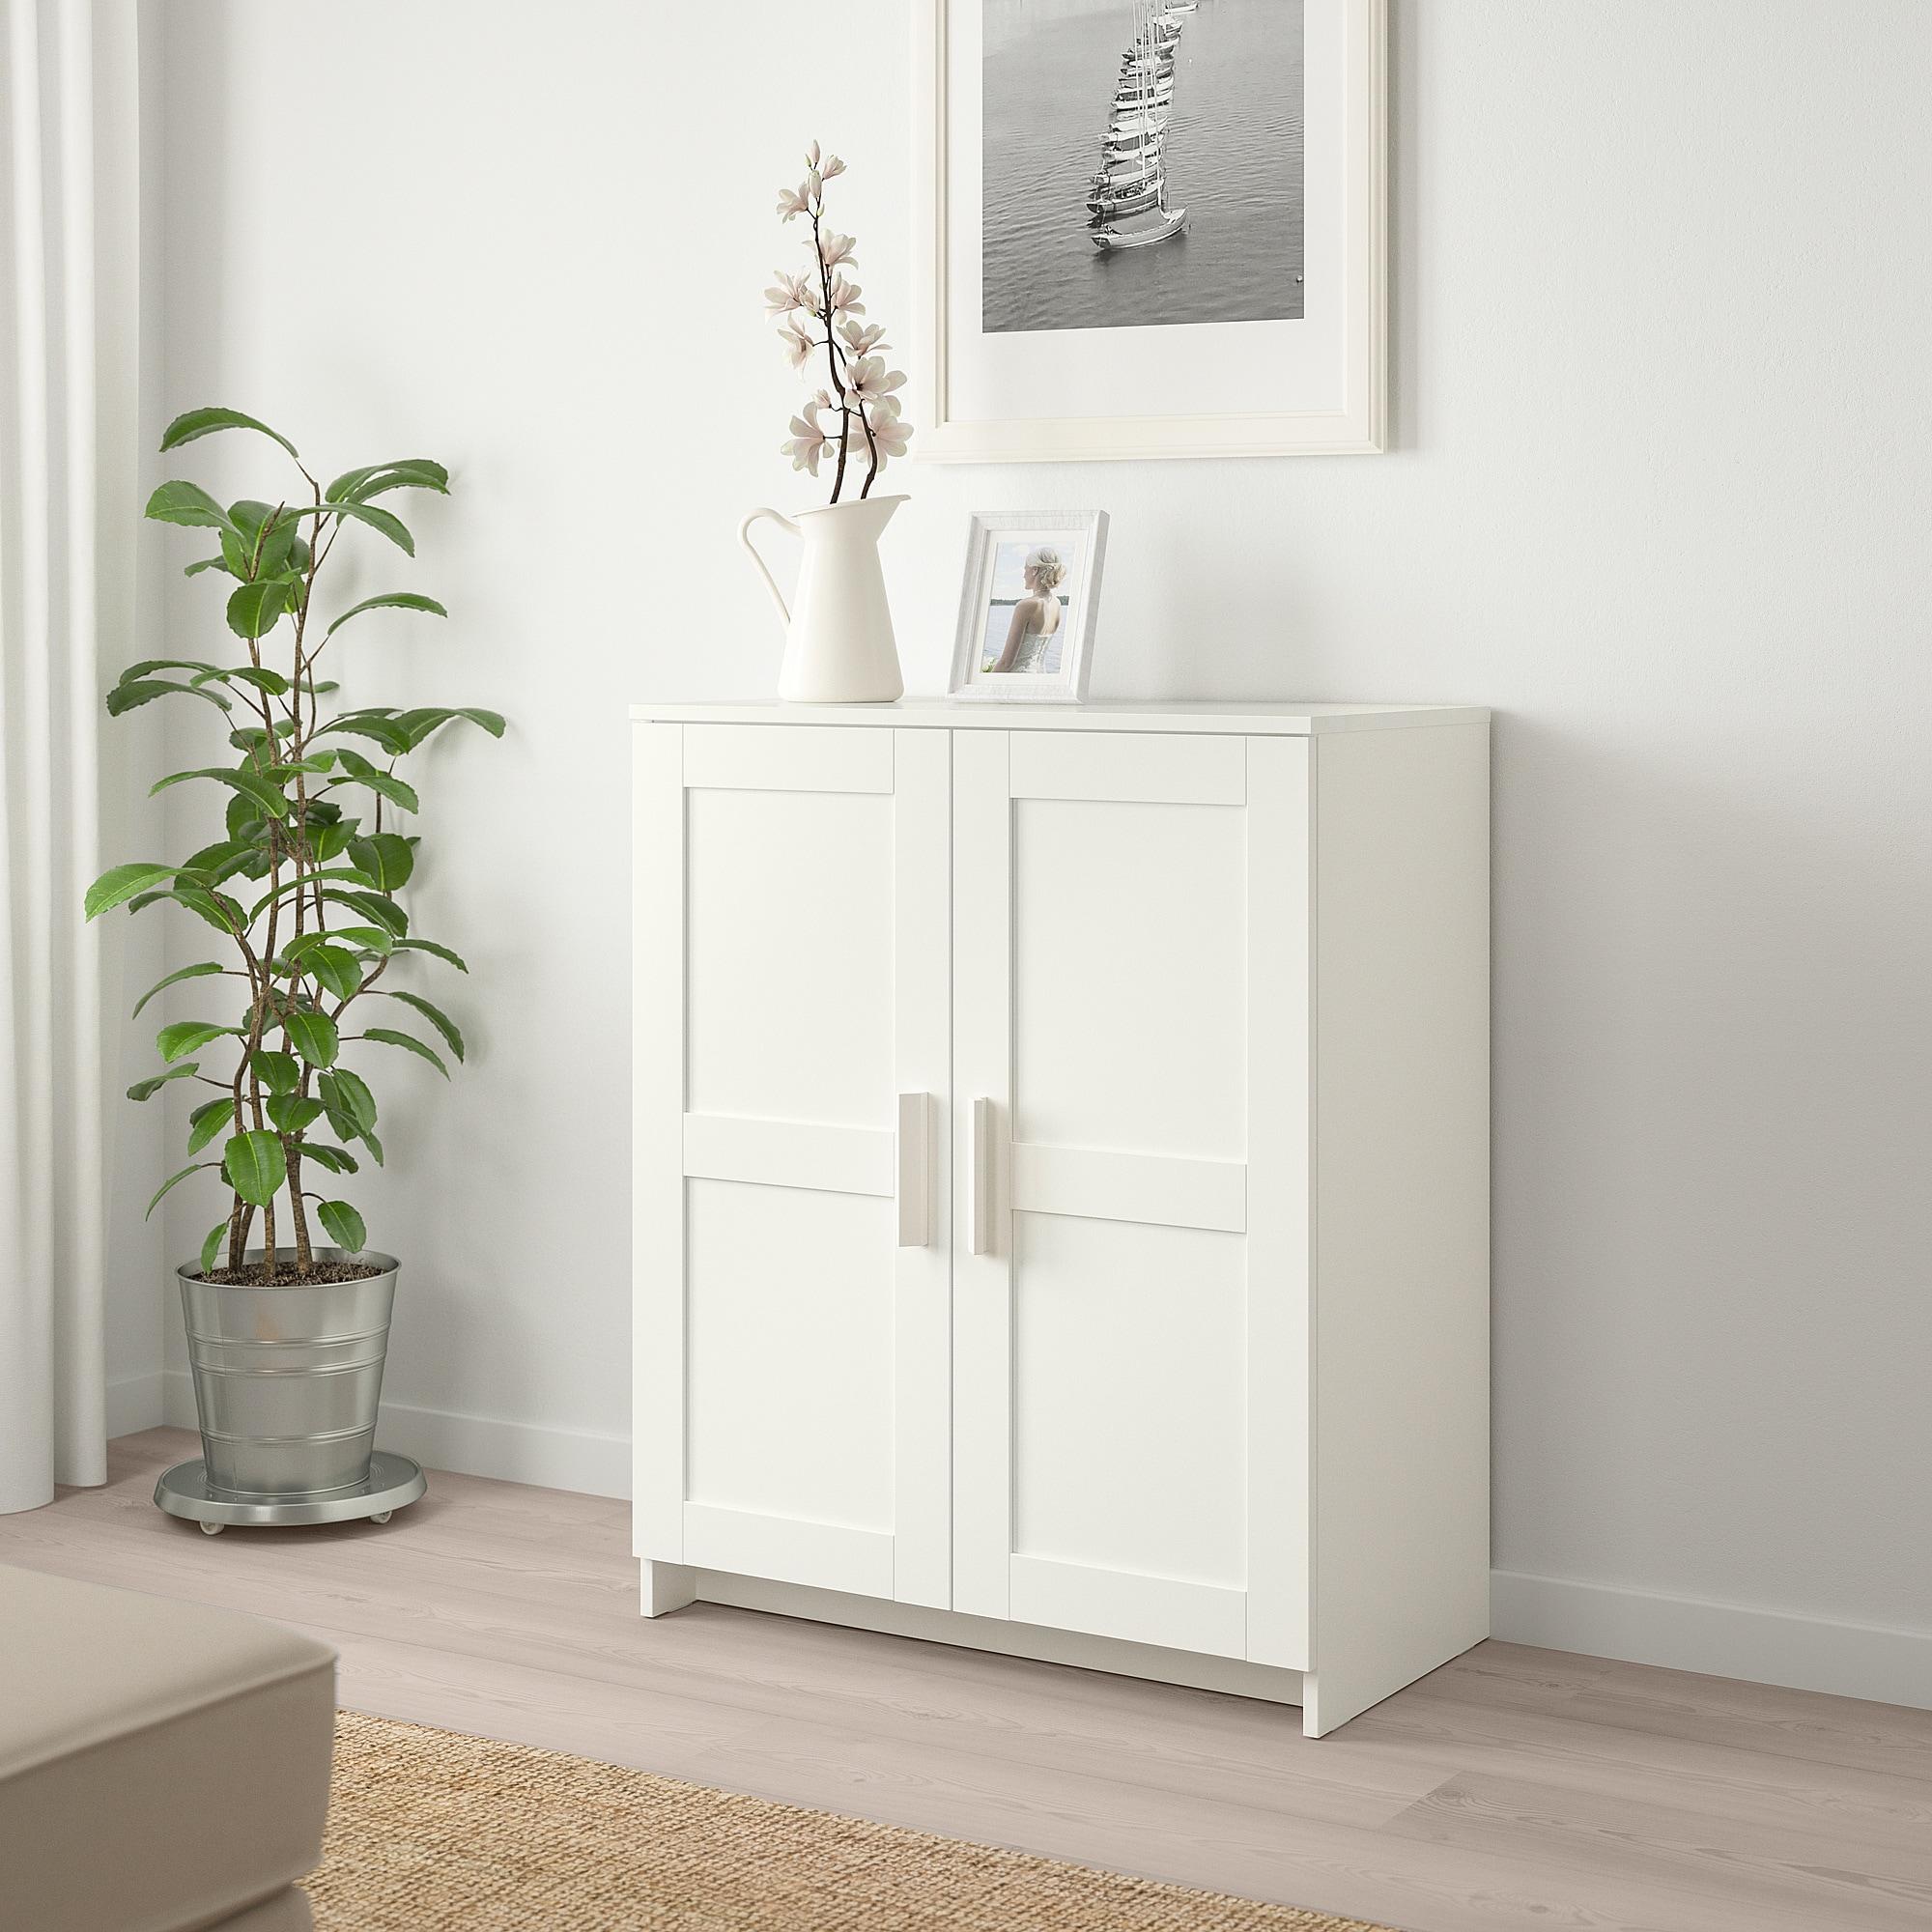 Best Ikea Brimnes Cabinet With Doors White Small Storage 640 x 480